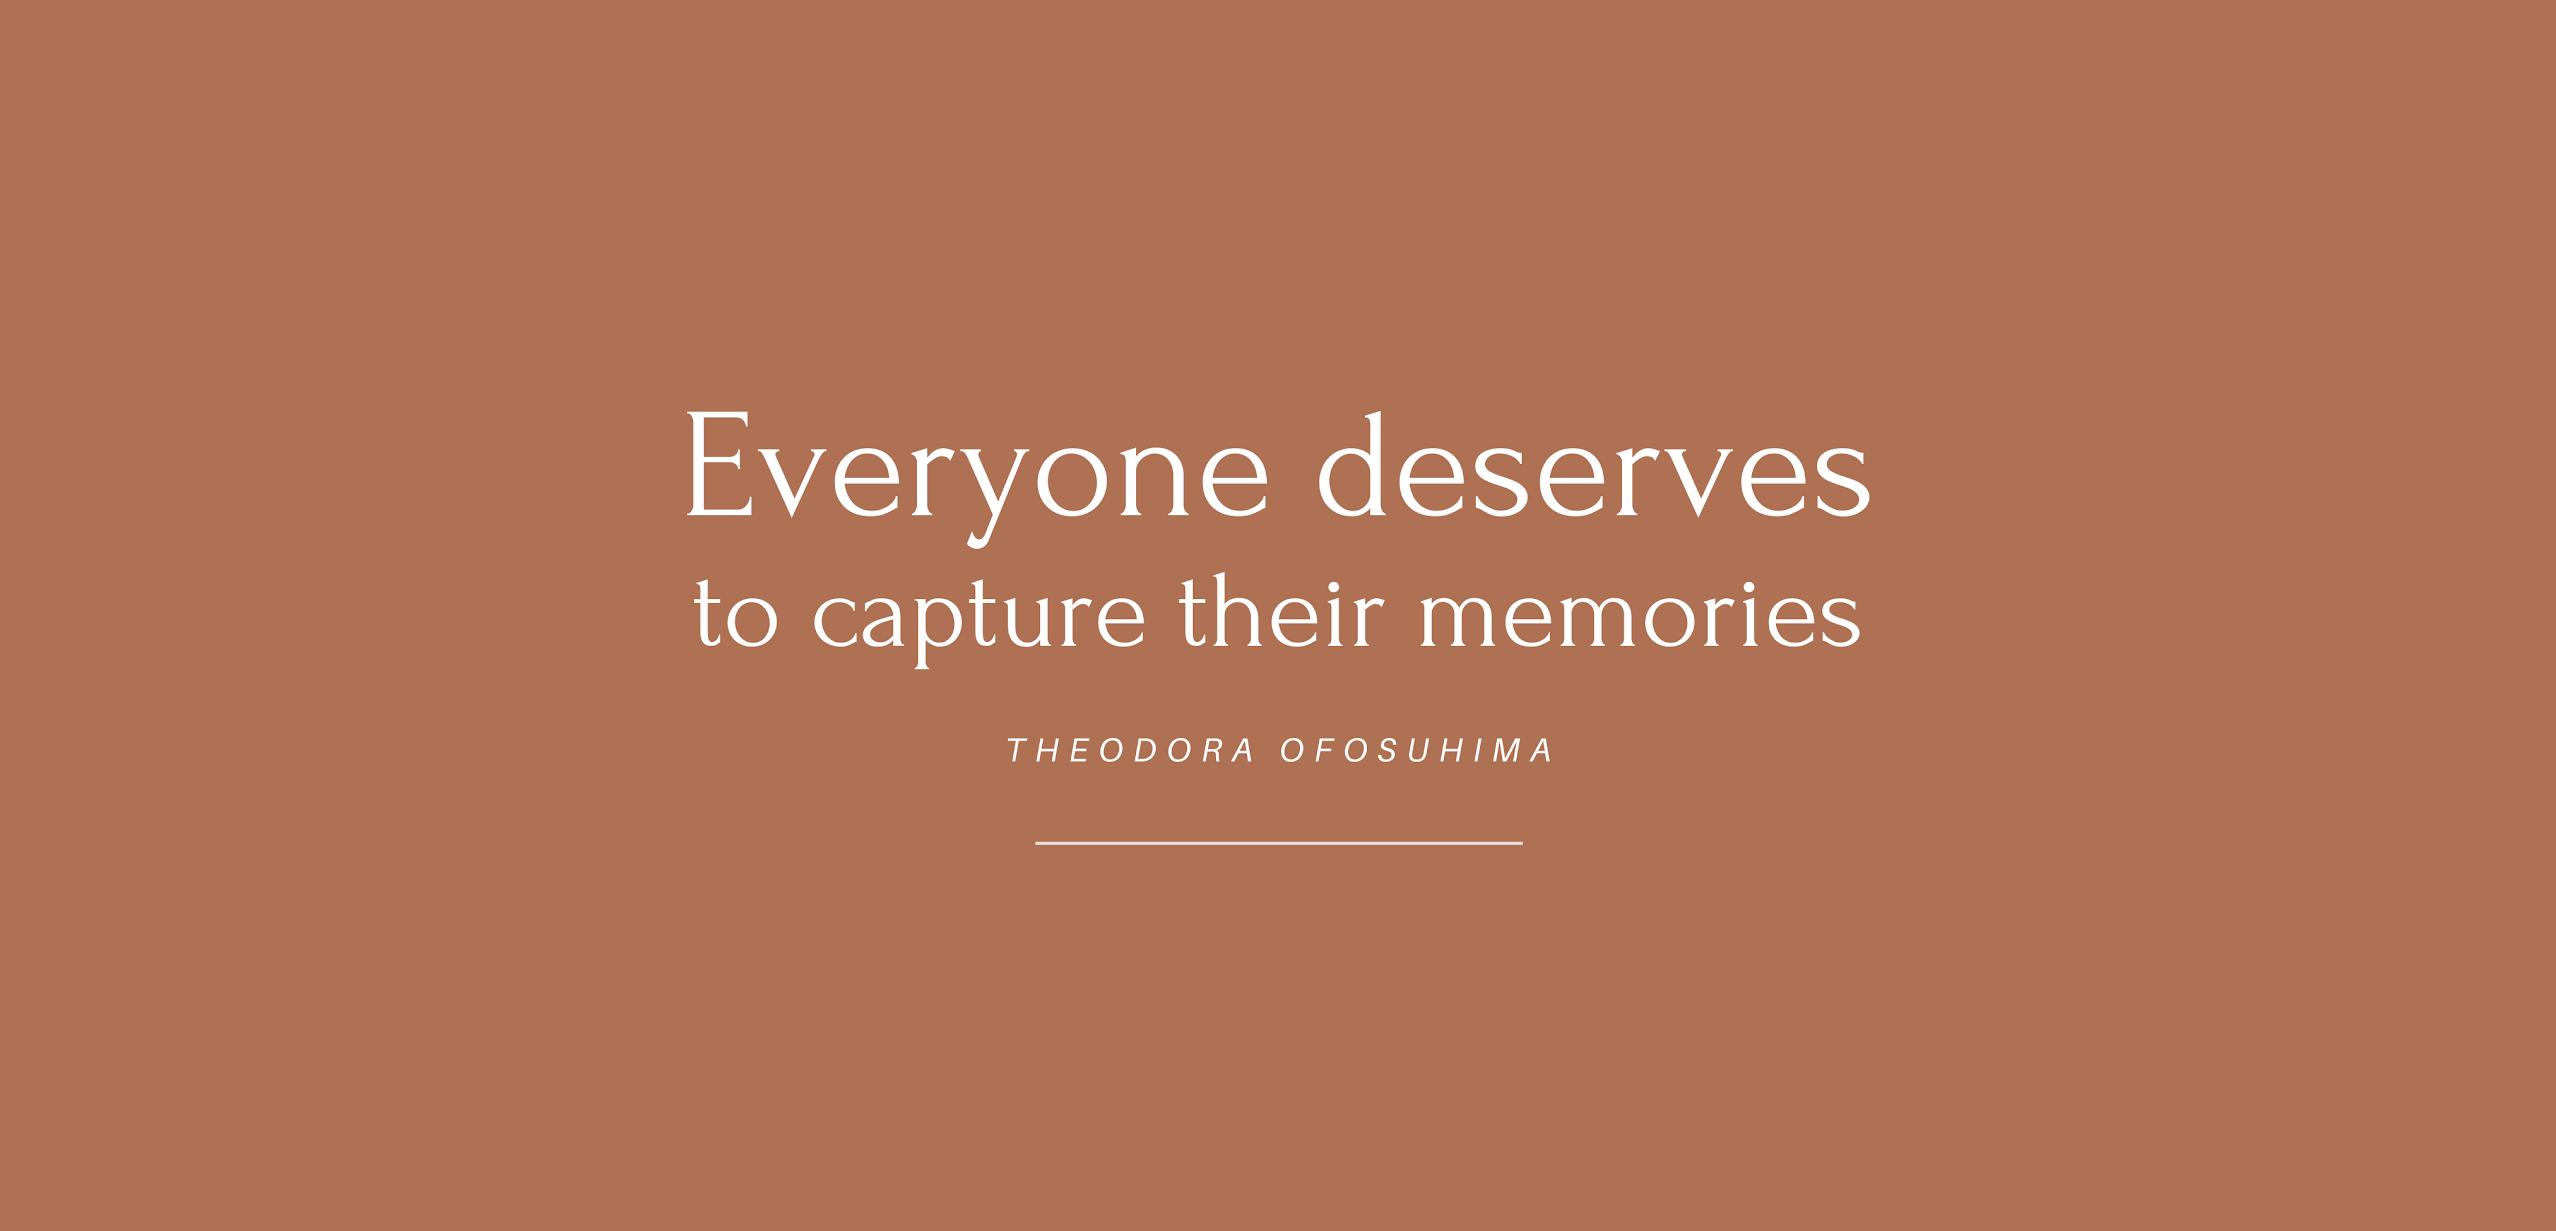 theodora ofosuhima photography